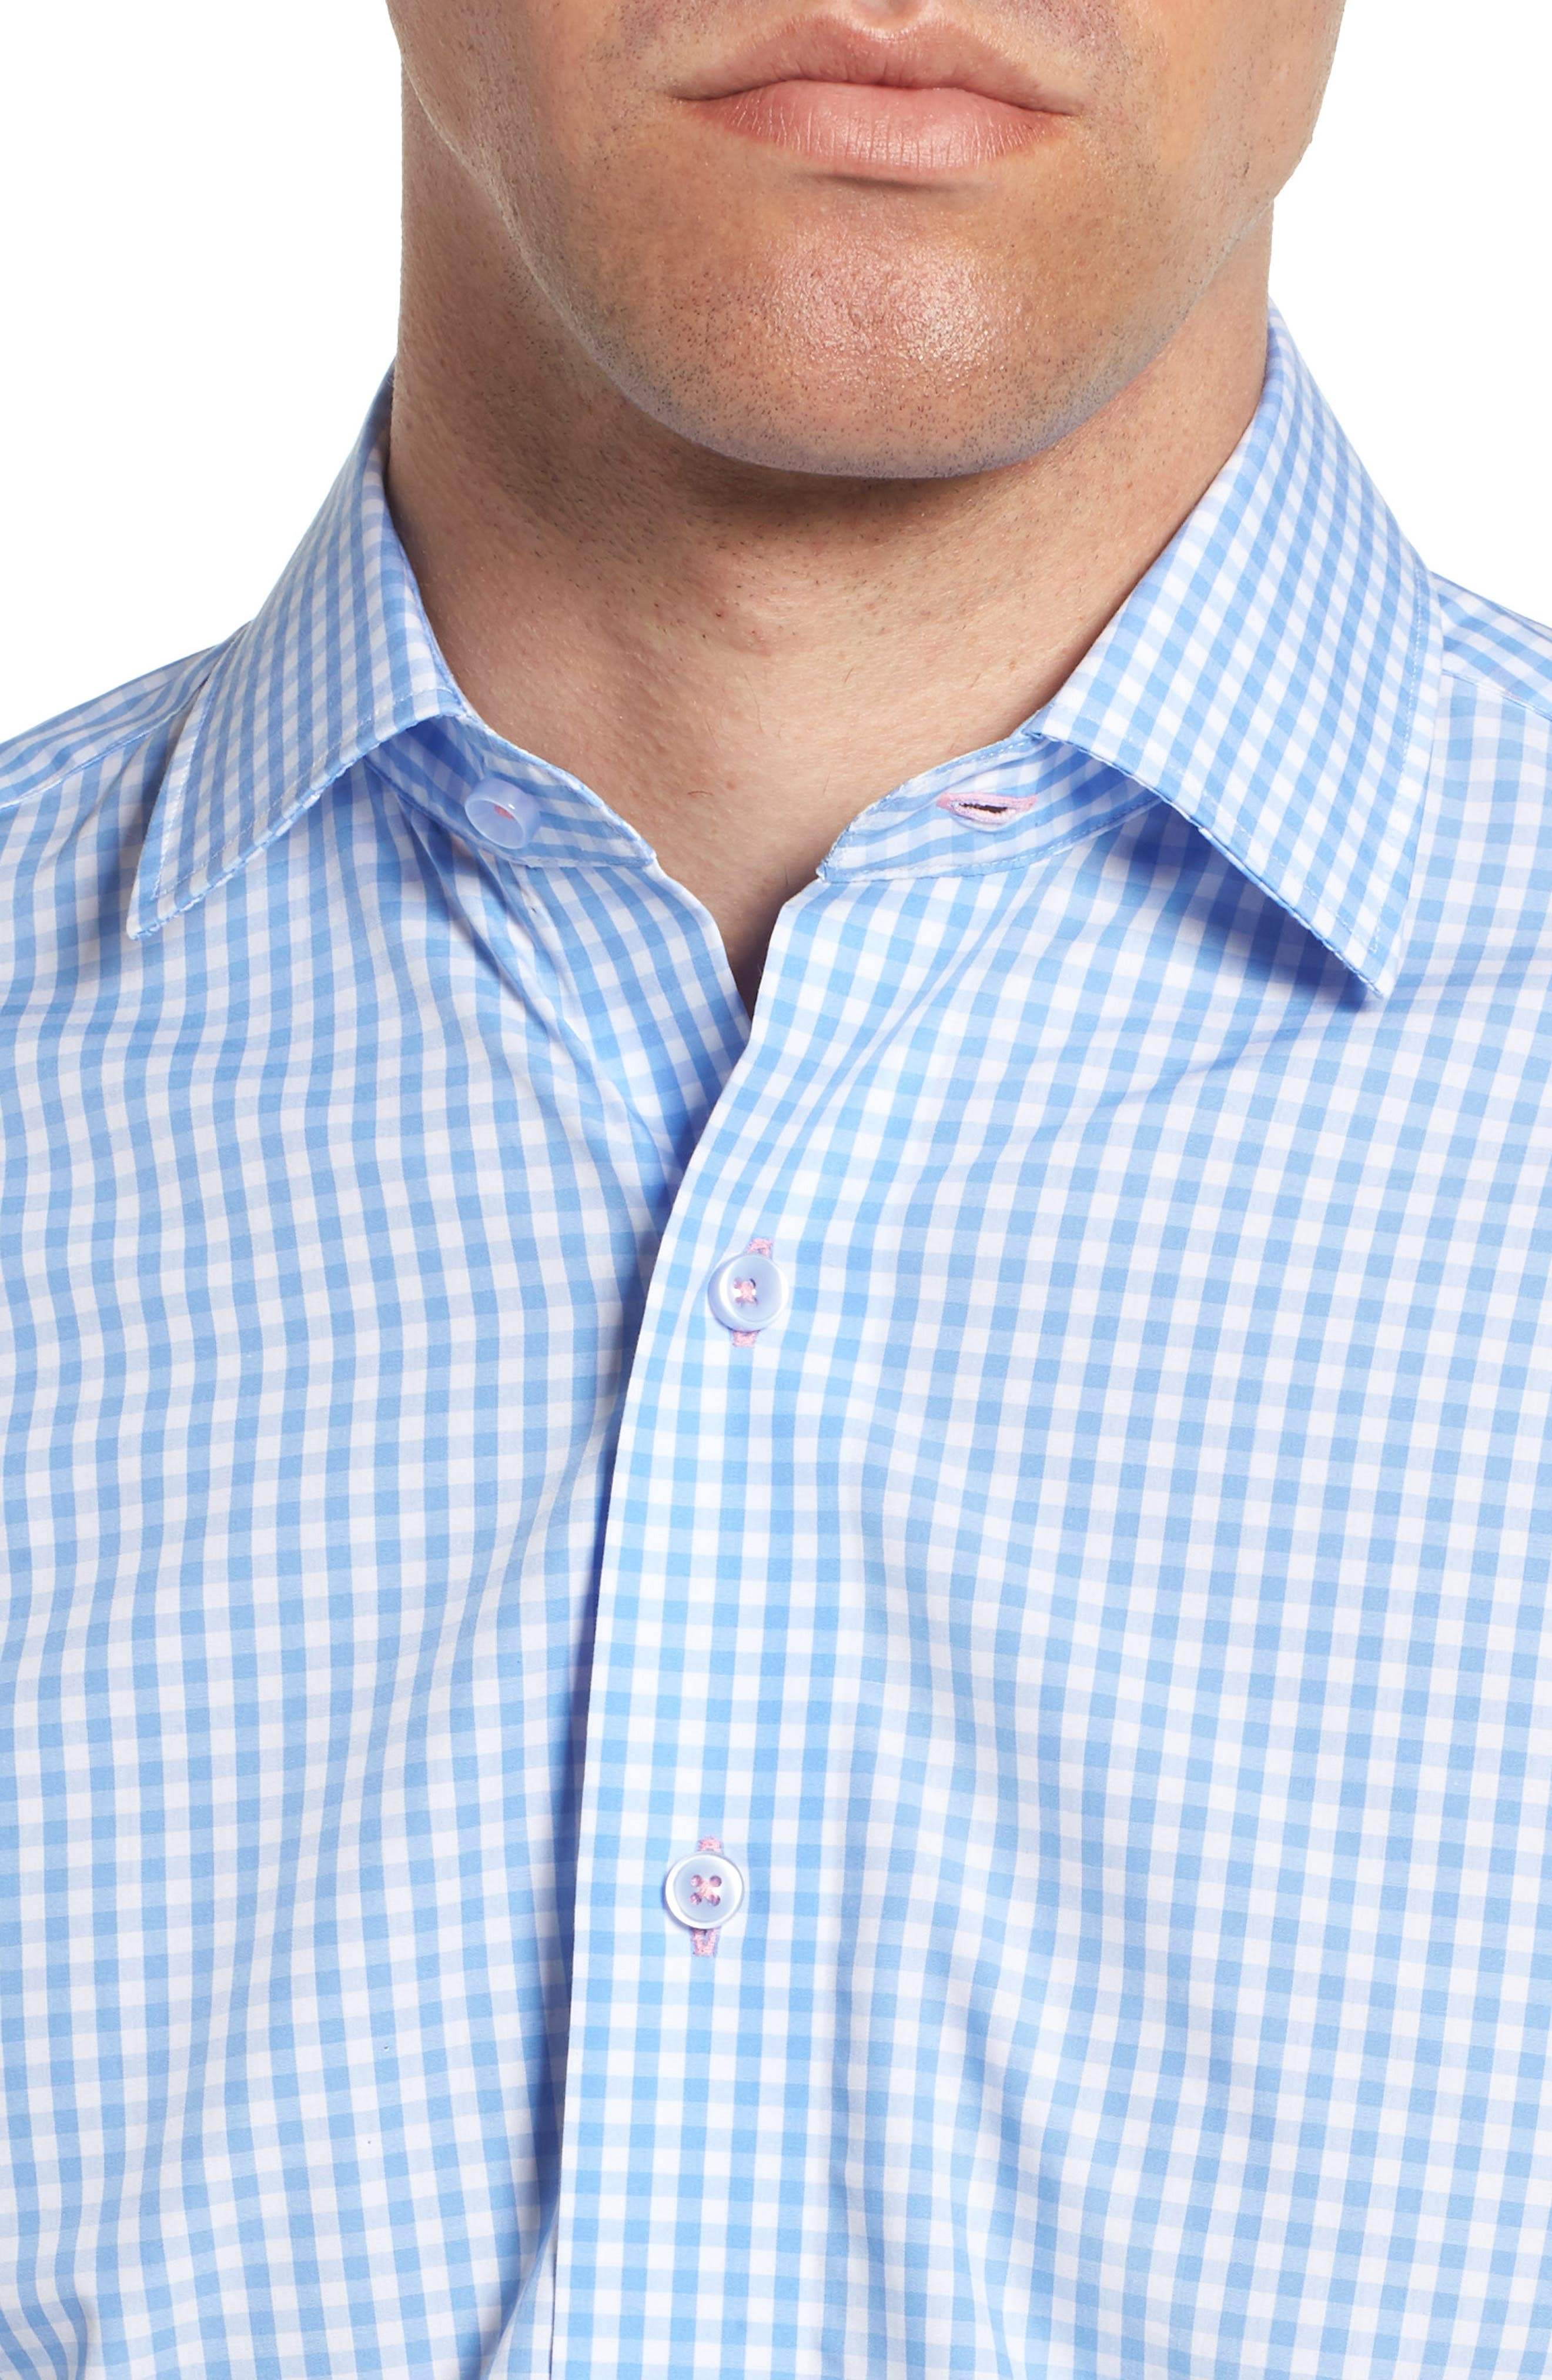 Trim Fit Check Dress Shirt,                             Alternate thumbnail 2, color,                             LIGHT BLUE